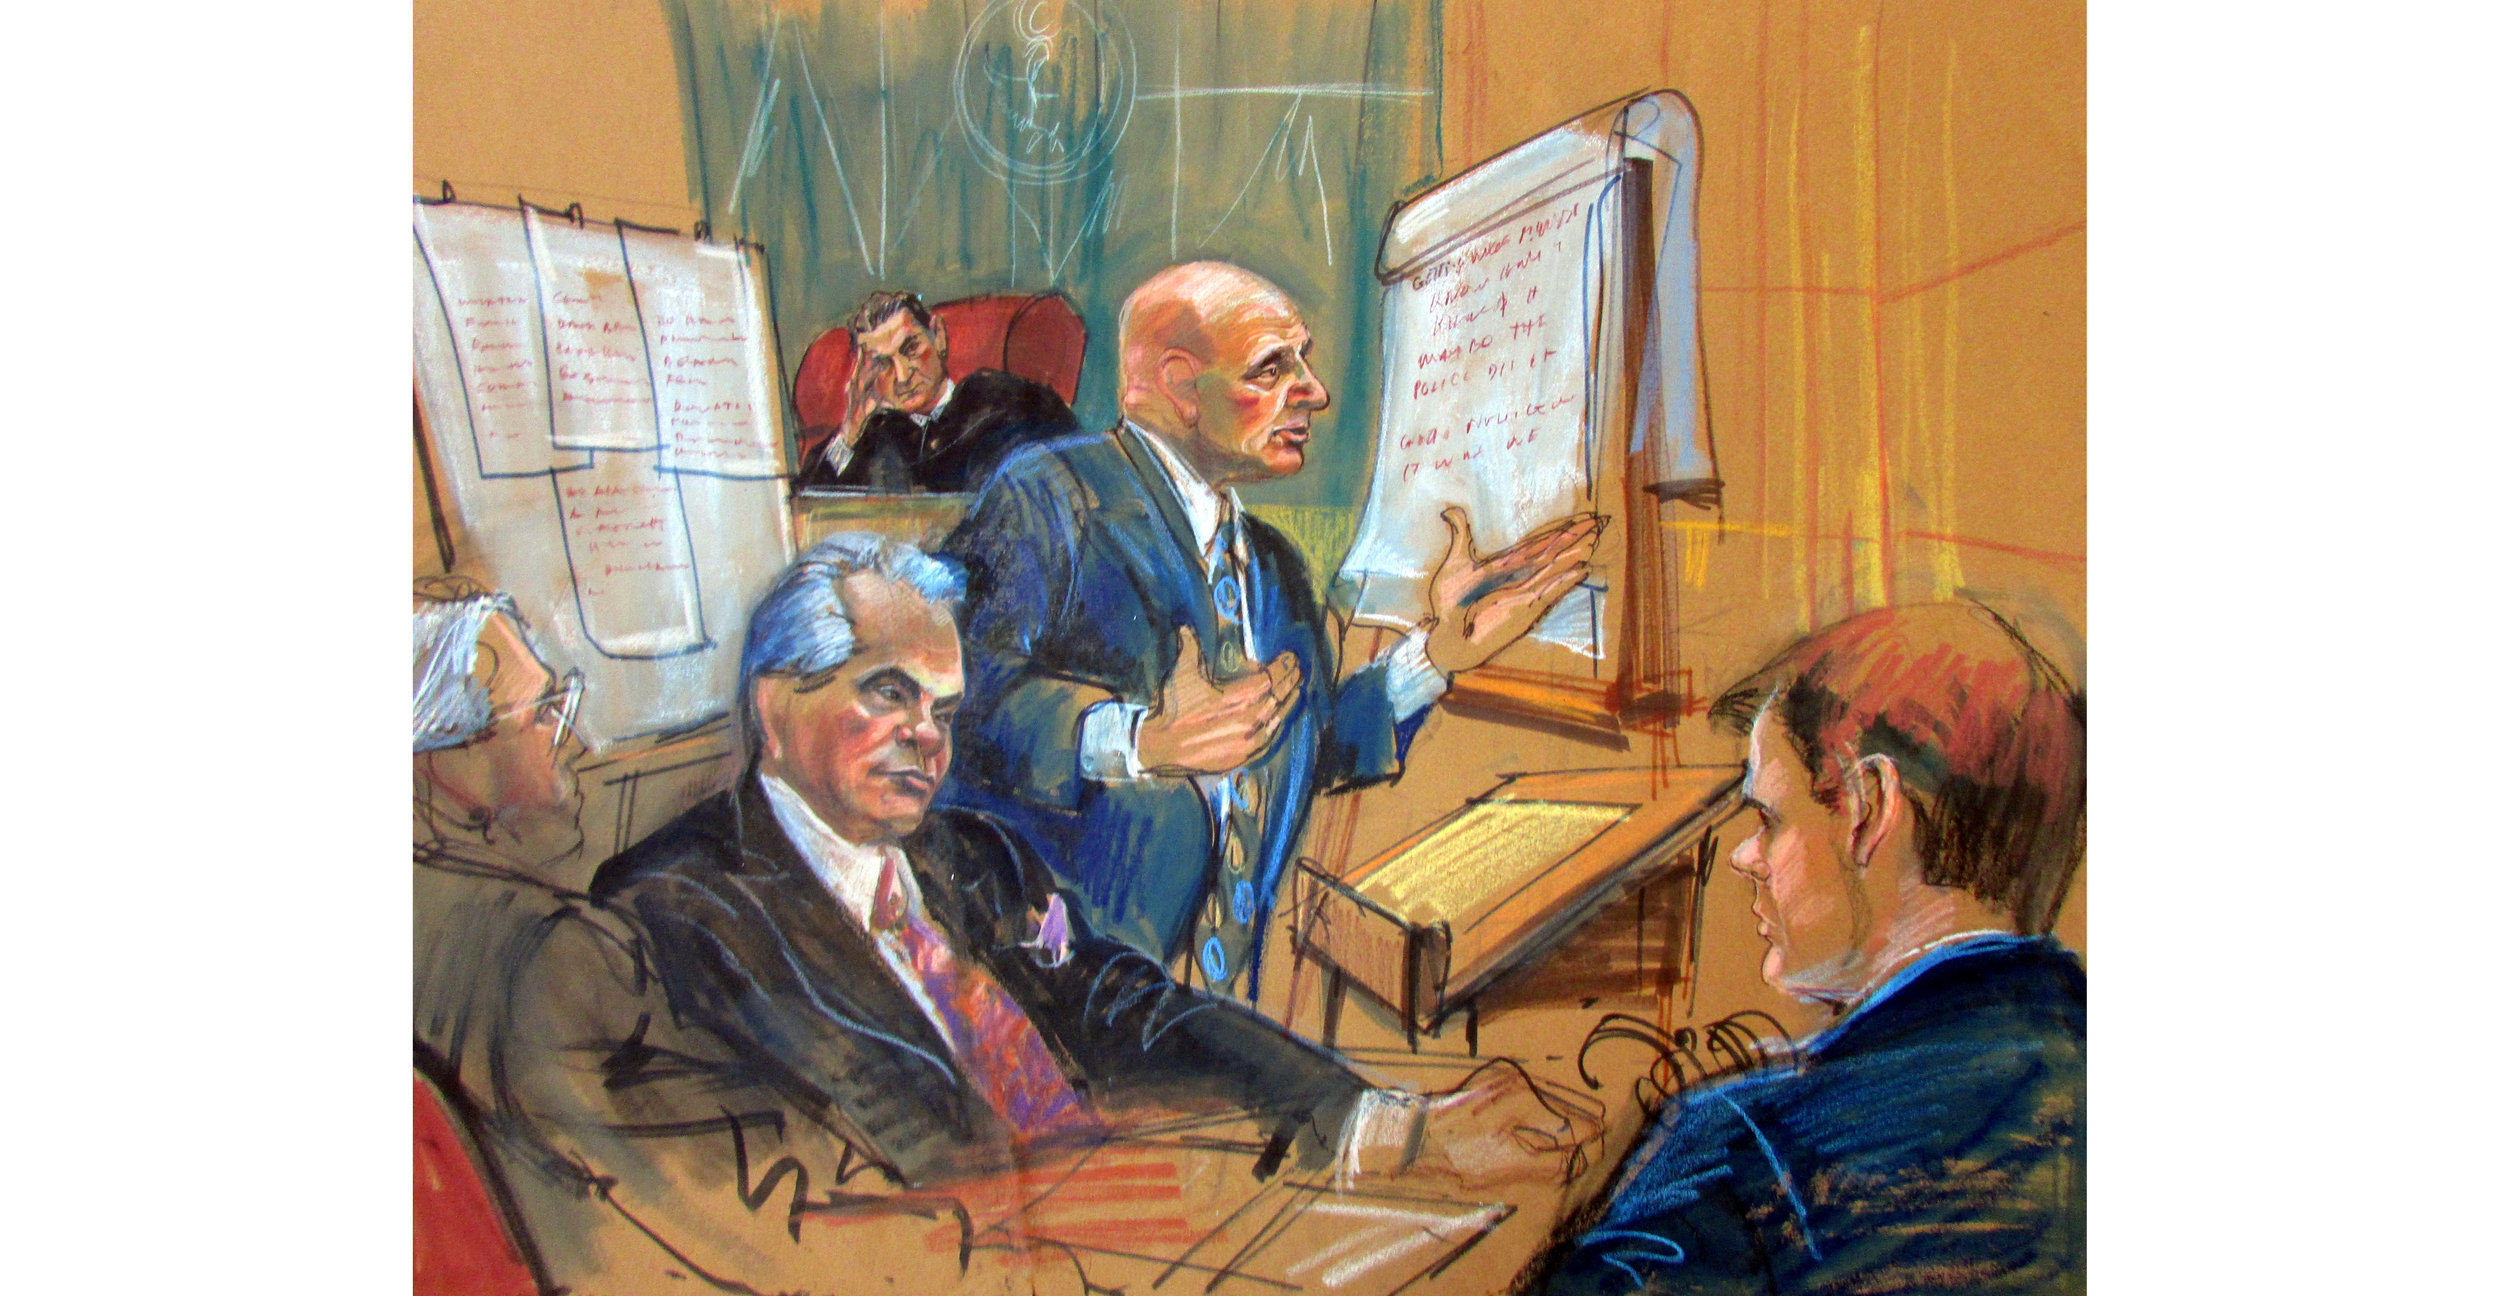 "John Gotti, Pencil, crayons, markers  26.5"" x 32.25"", 1992"